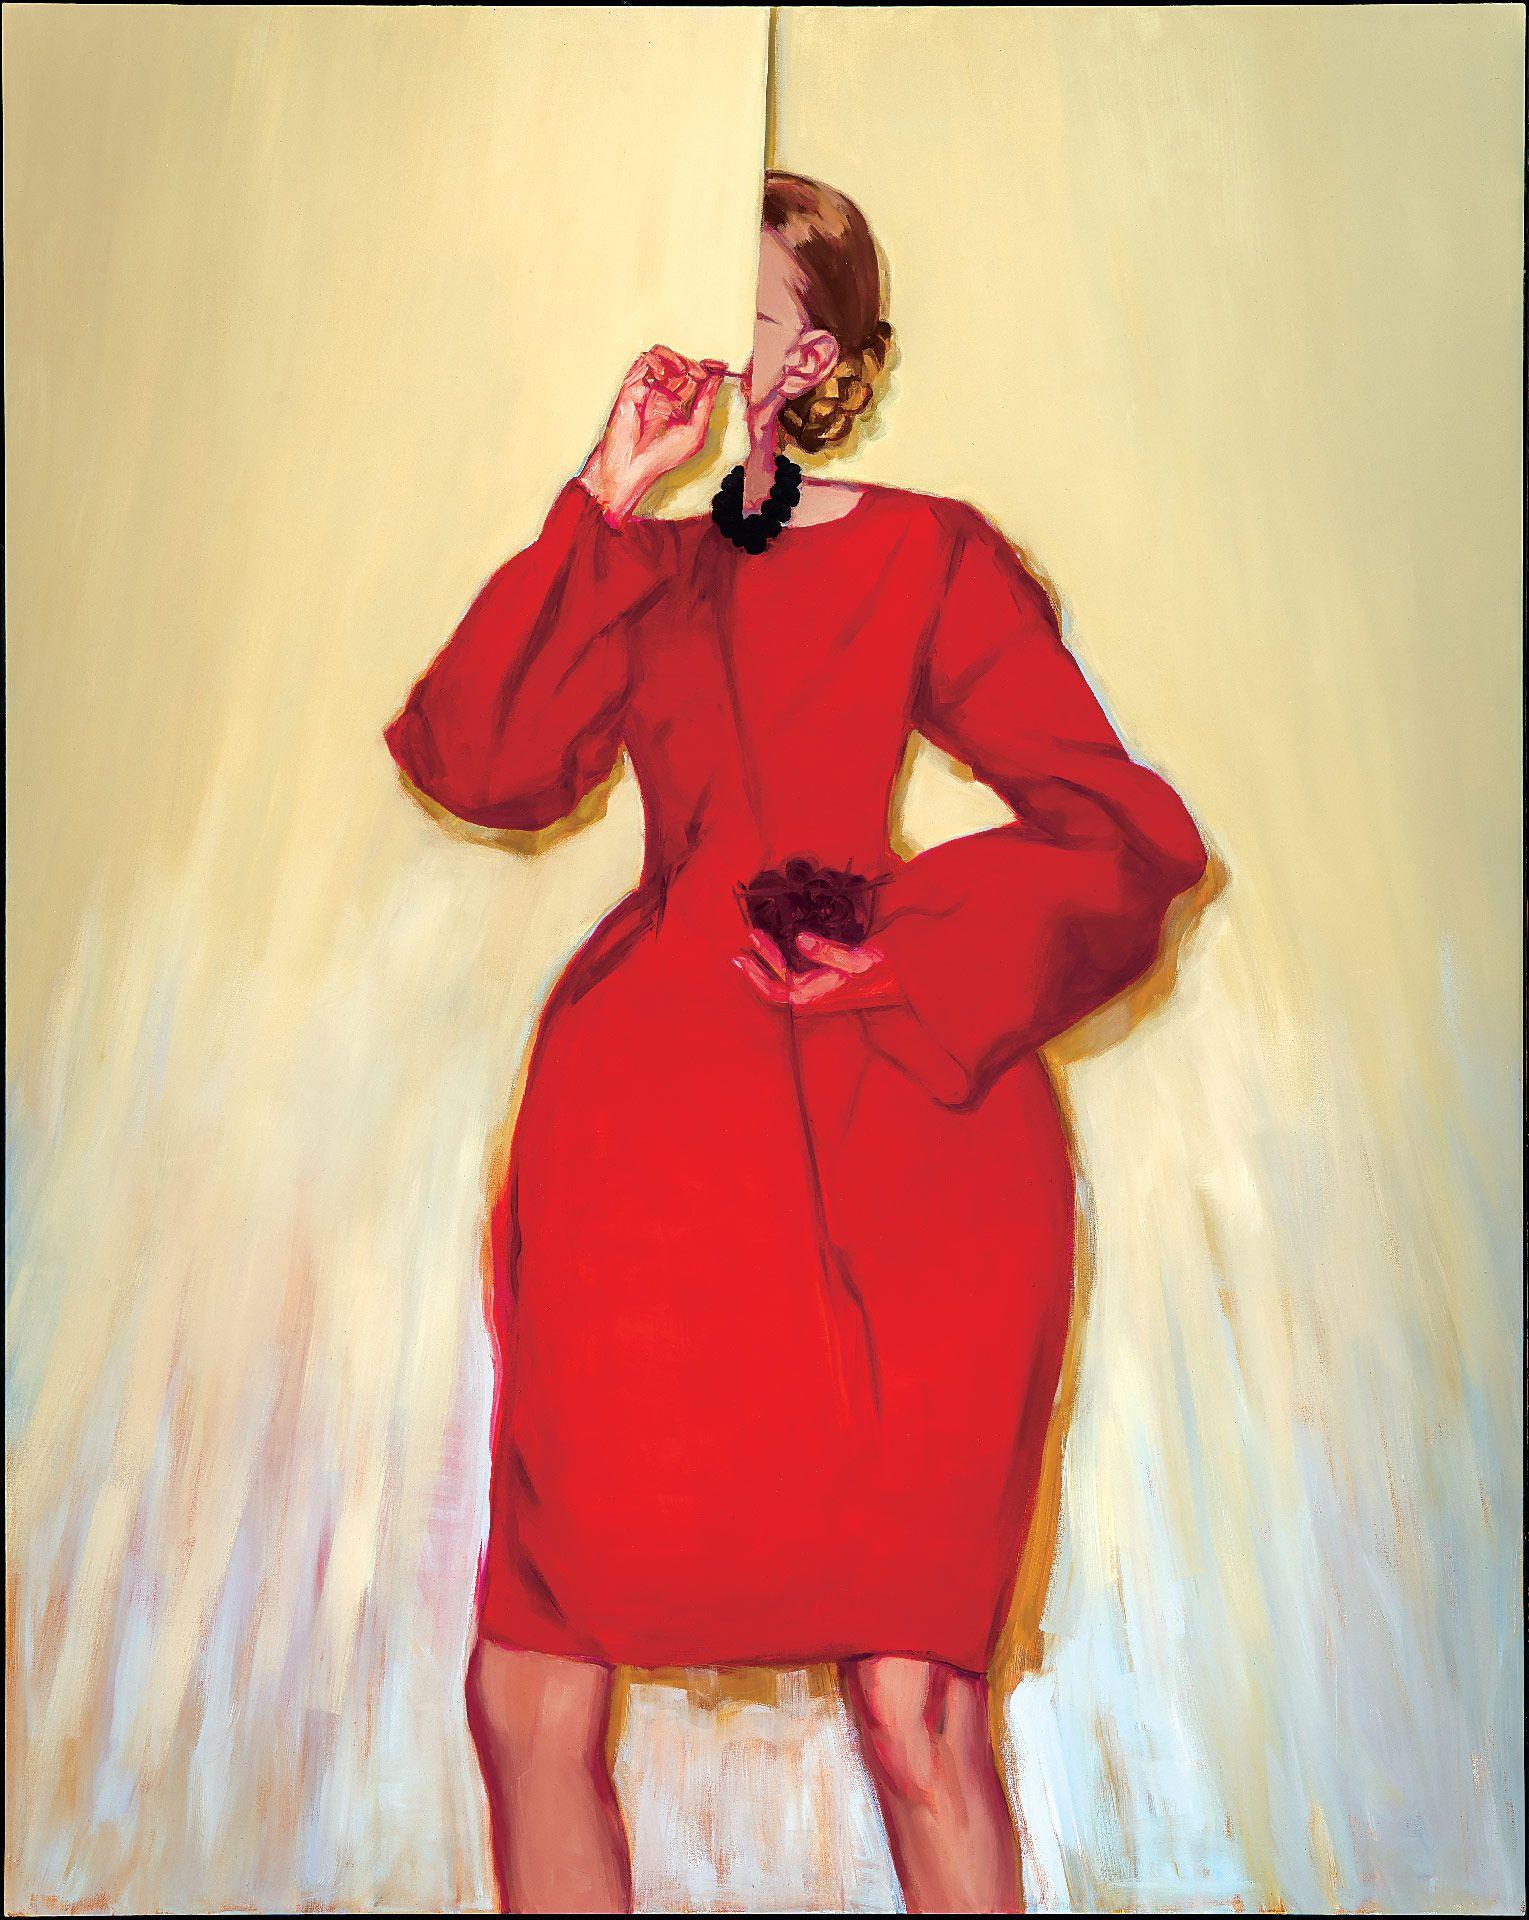 Janet Werner (born in 1959), Carey, 2014, Oil on canvas, 249.2 x 198.2 x 4.2 cm. MMFA, purchase, F. Cleveland Morgan Fund. Photo MMFA, Christine Guest